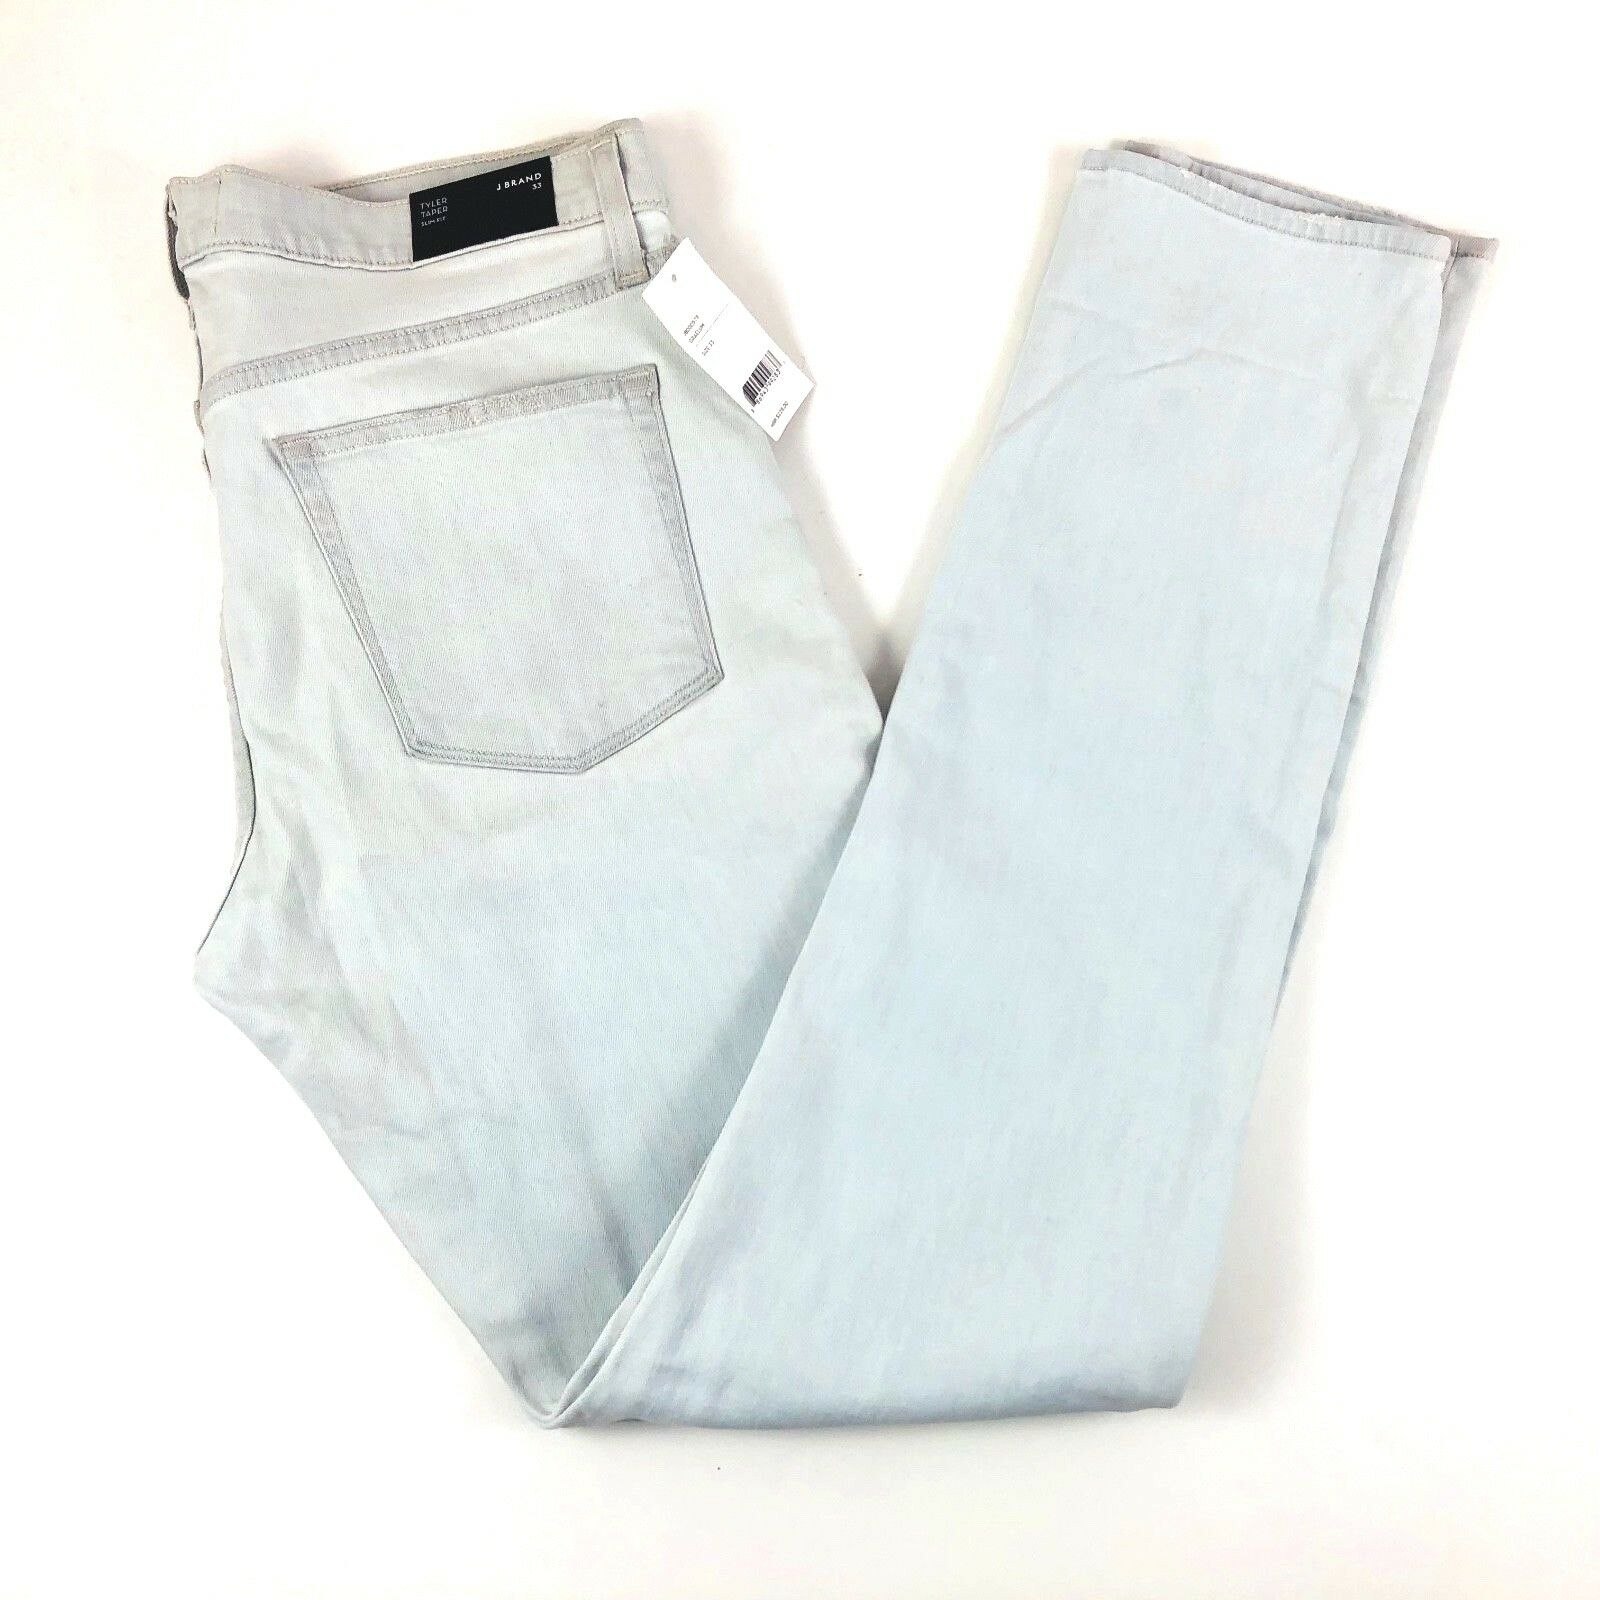 e1dd2a03 J Brand Tyler Slim Stretch Wash Denim Jeans Mens 33x34 NWT Light Taper  nfhxiy5423-Jeans